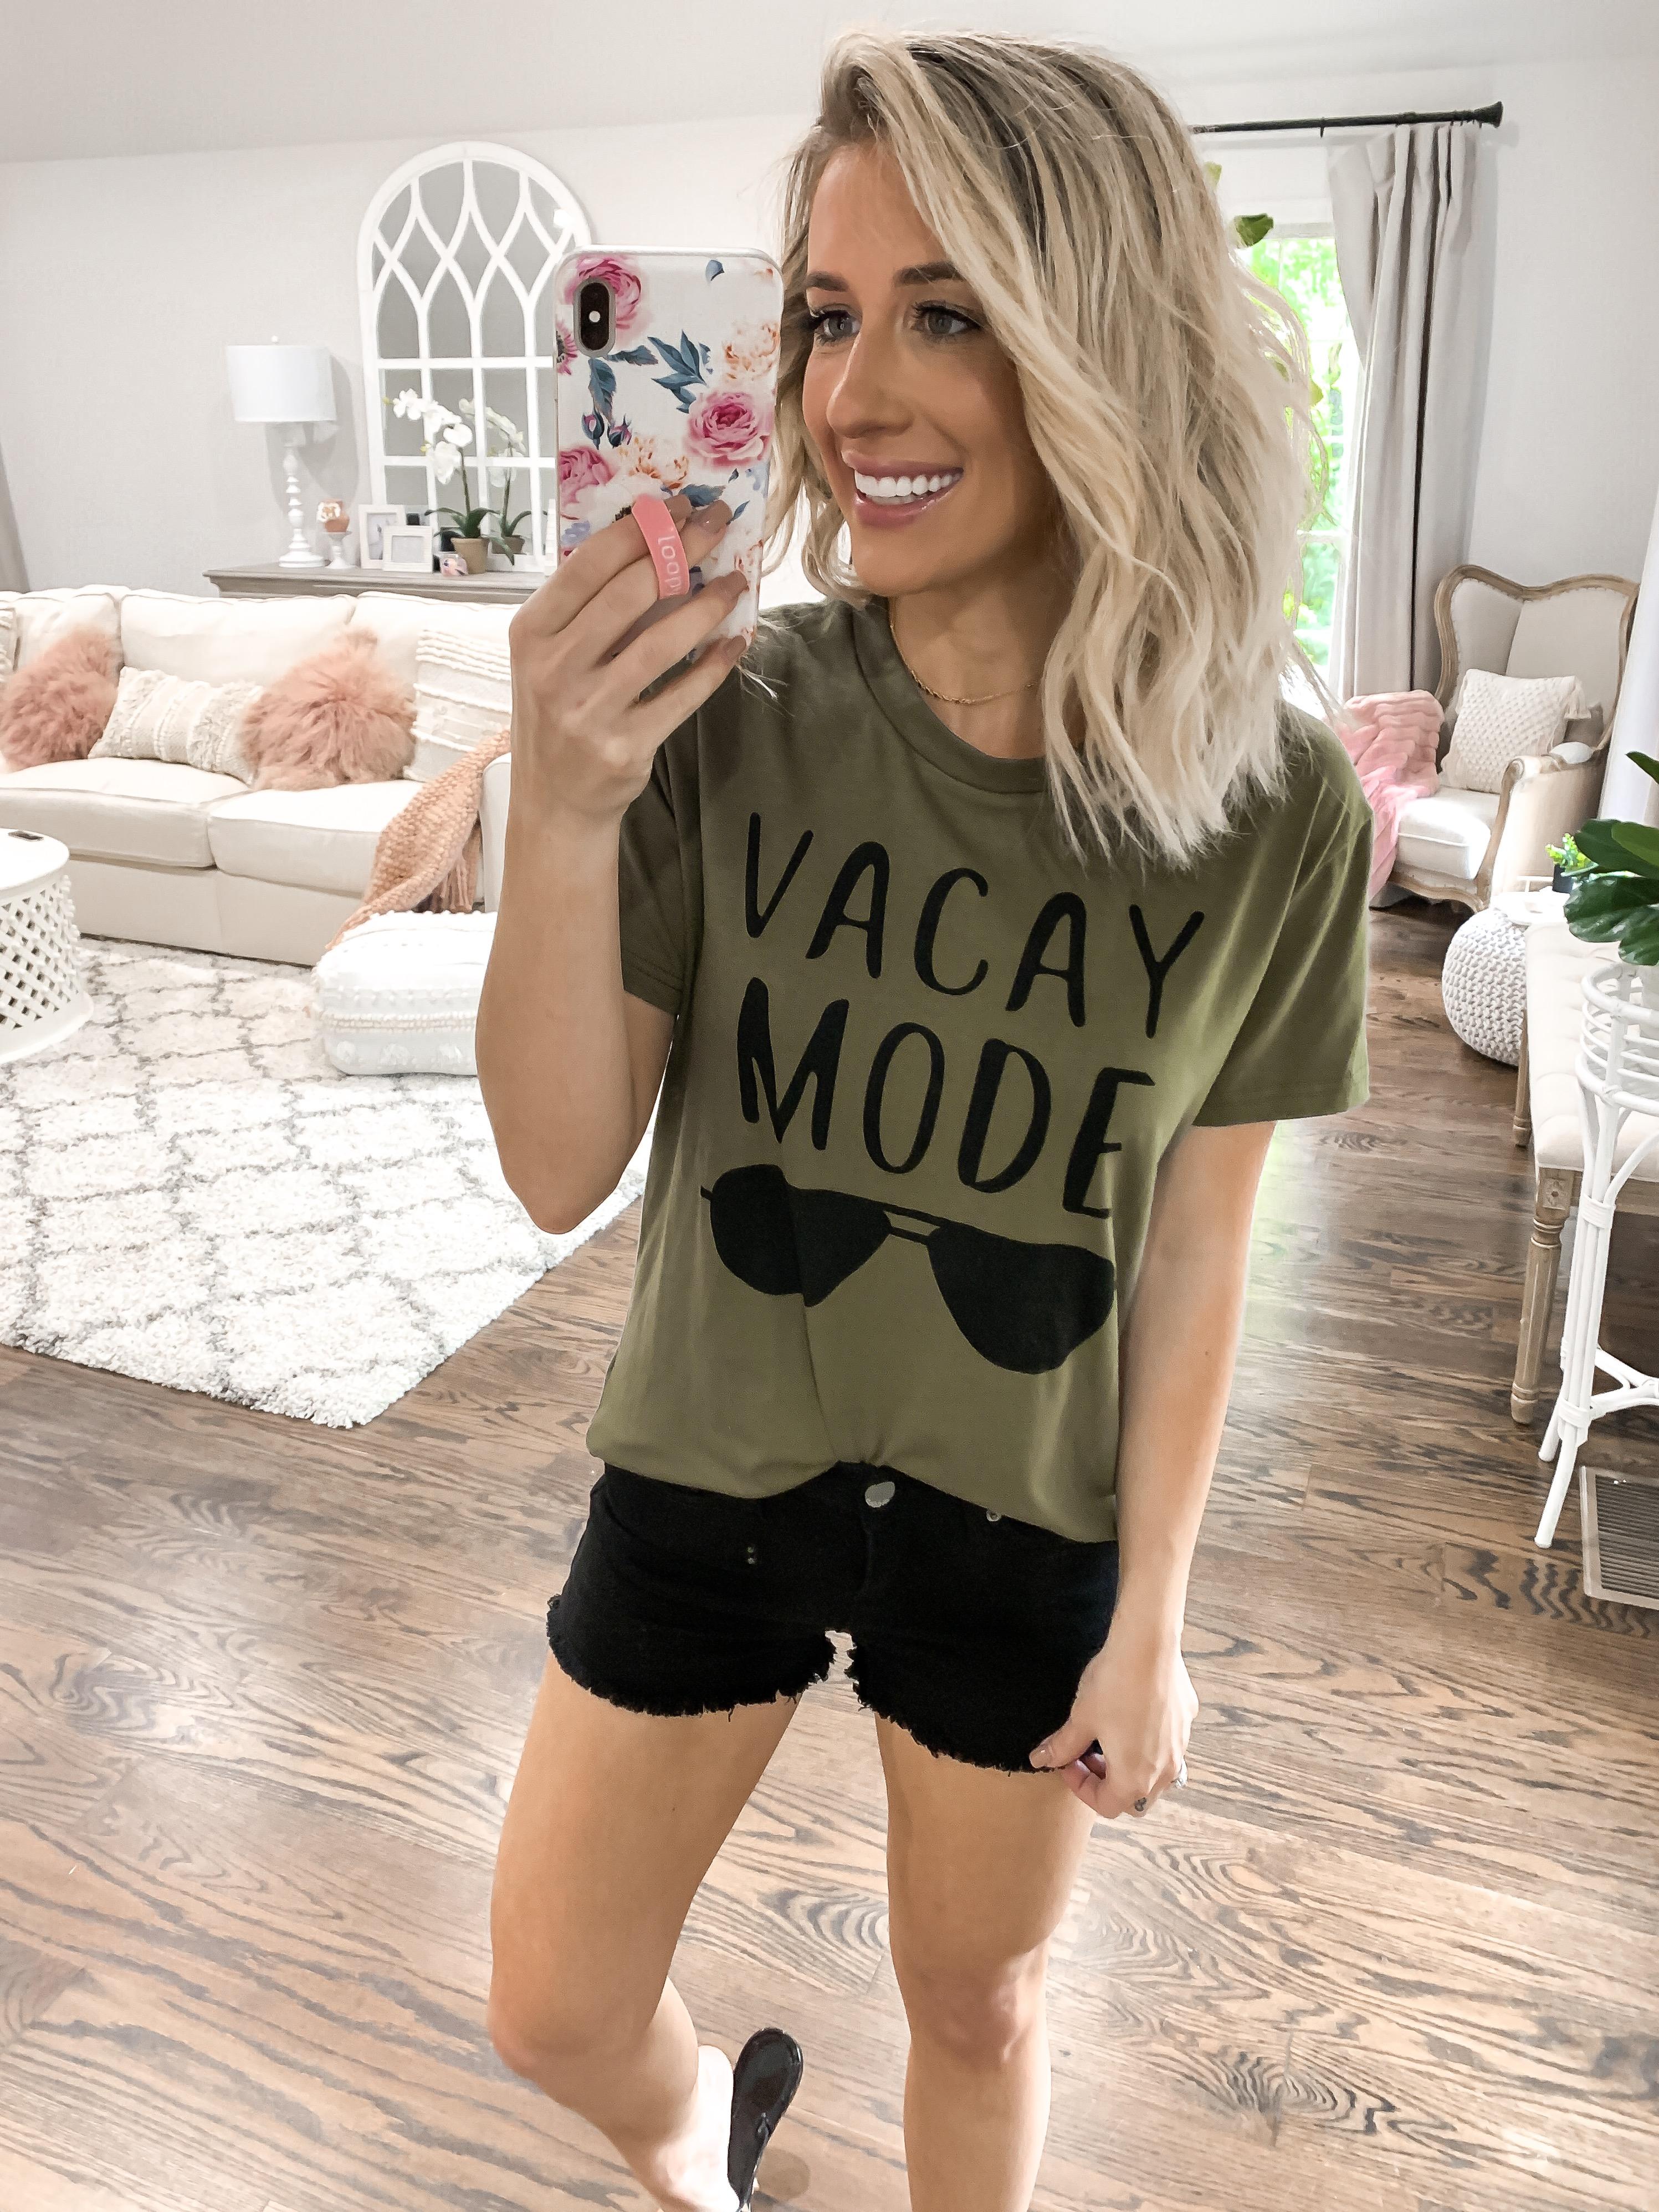 summer finds under $25 vacay mode amazon tshirt Black shorts short blonde hair laura beverlin